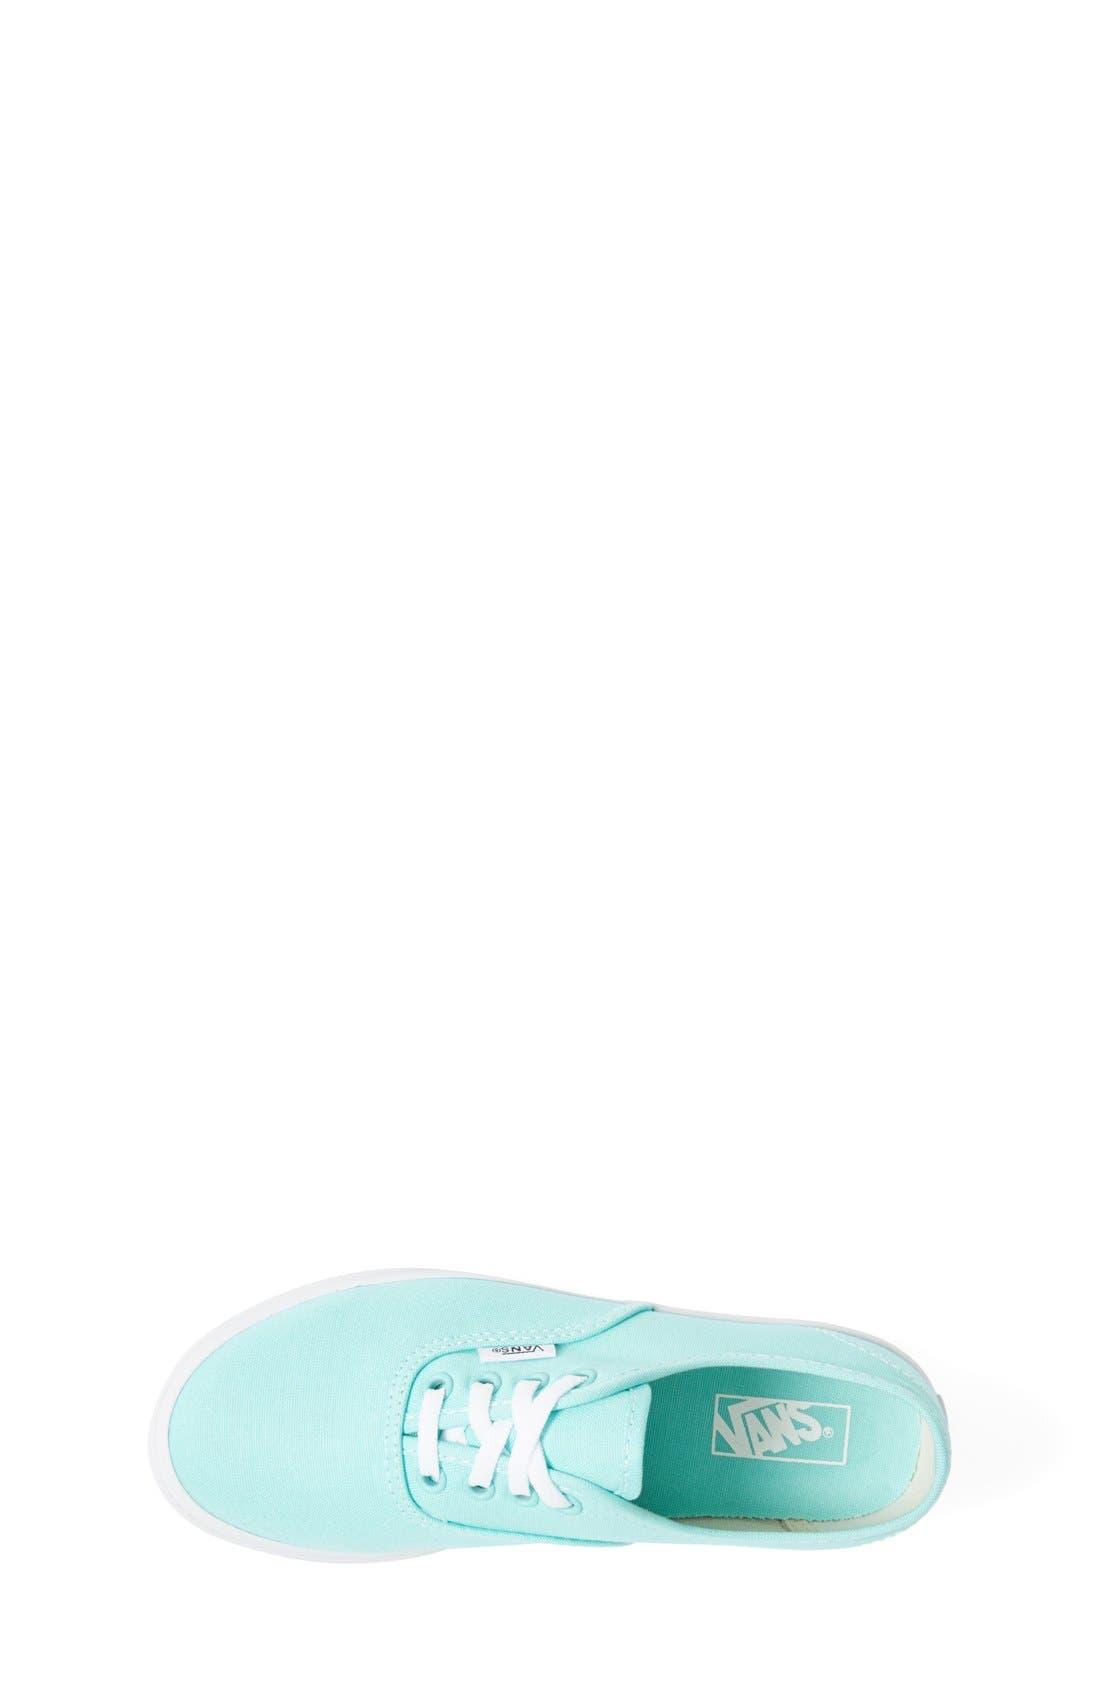 Alternate Image 3  - Vans 'Authentic - Lo Pro' Sneaker (Toddler, Little Kid & Big Kid)